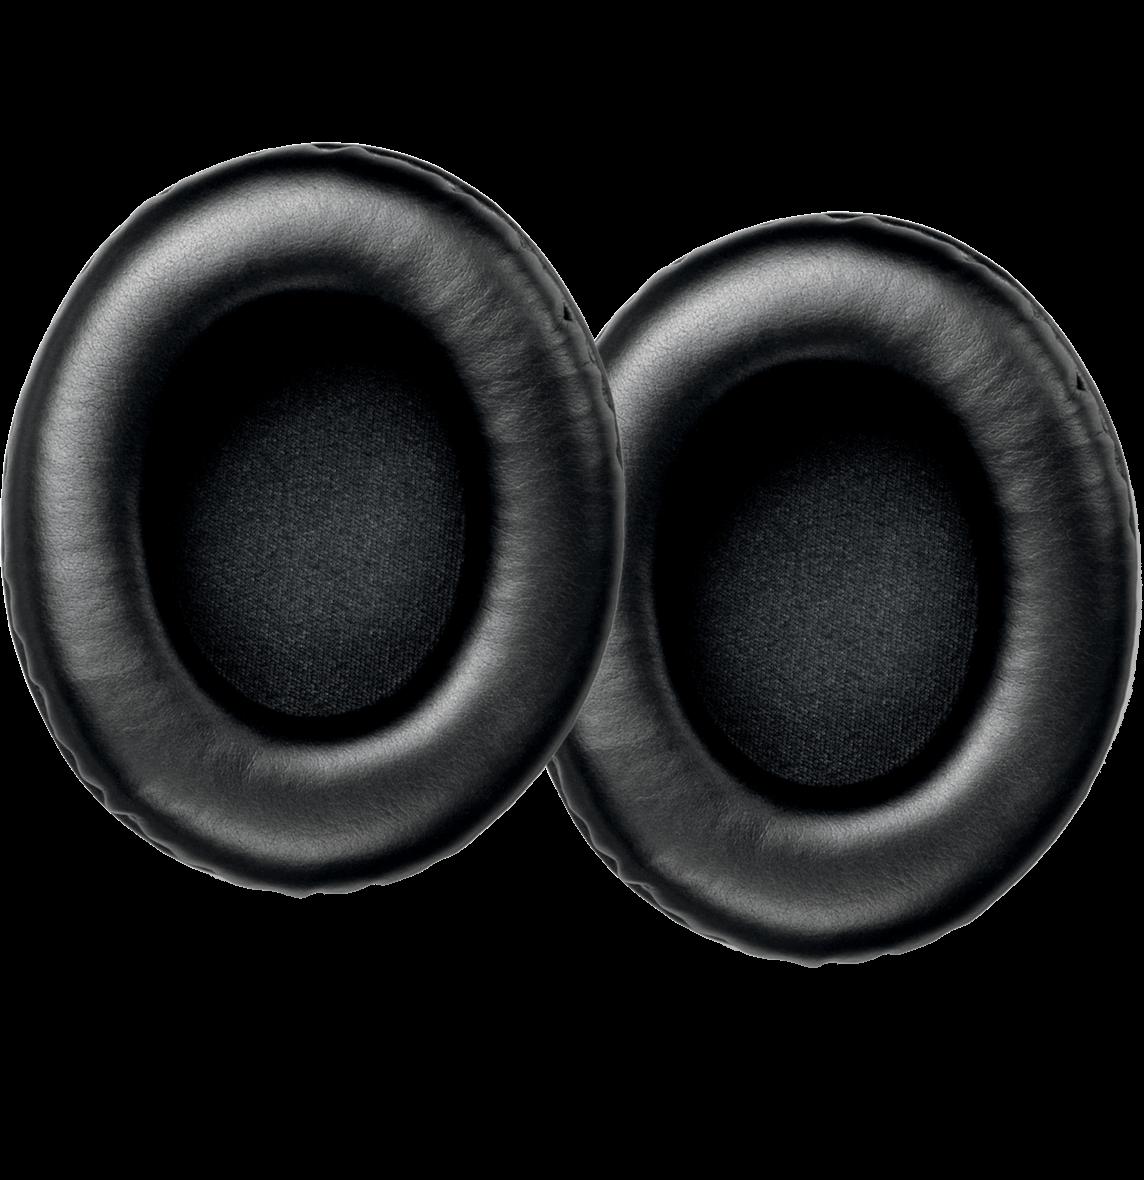 Shure BCAEC440 Ear Pads for BRH440M/BRH441M, Pair